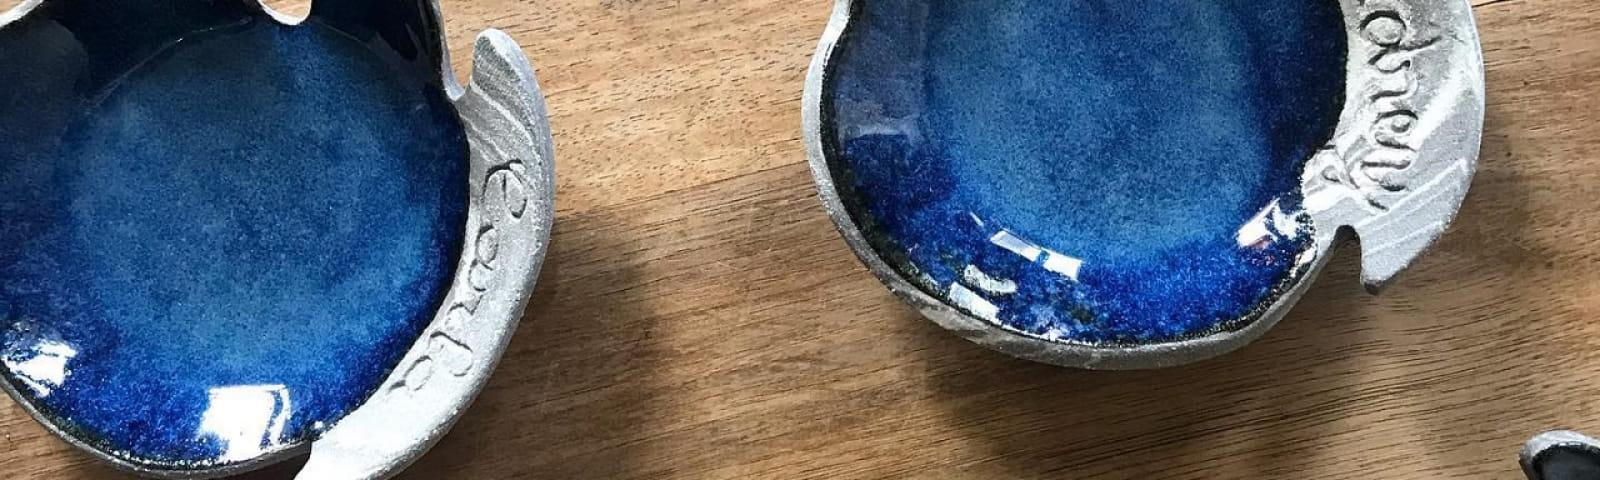 céramique-pays-de-sarrebourg